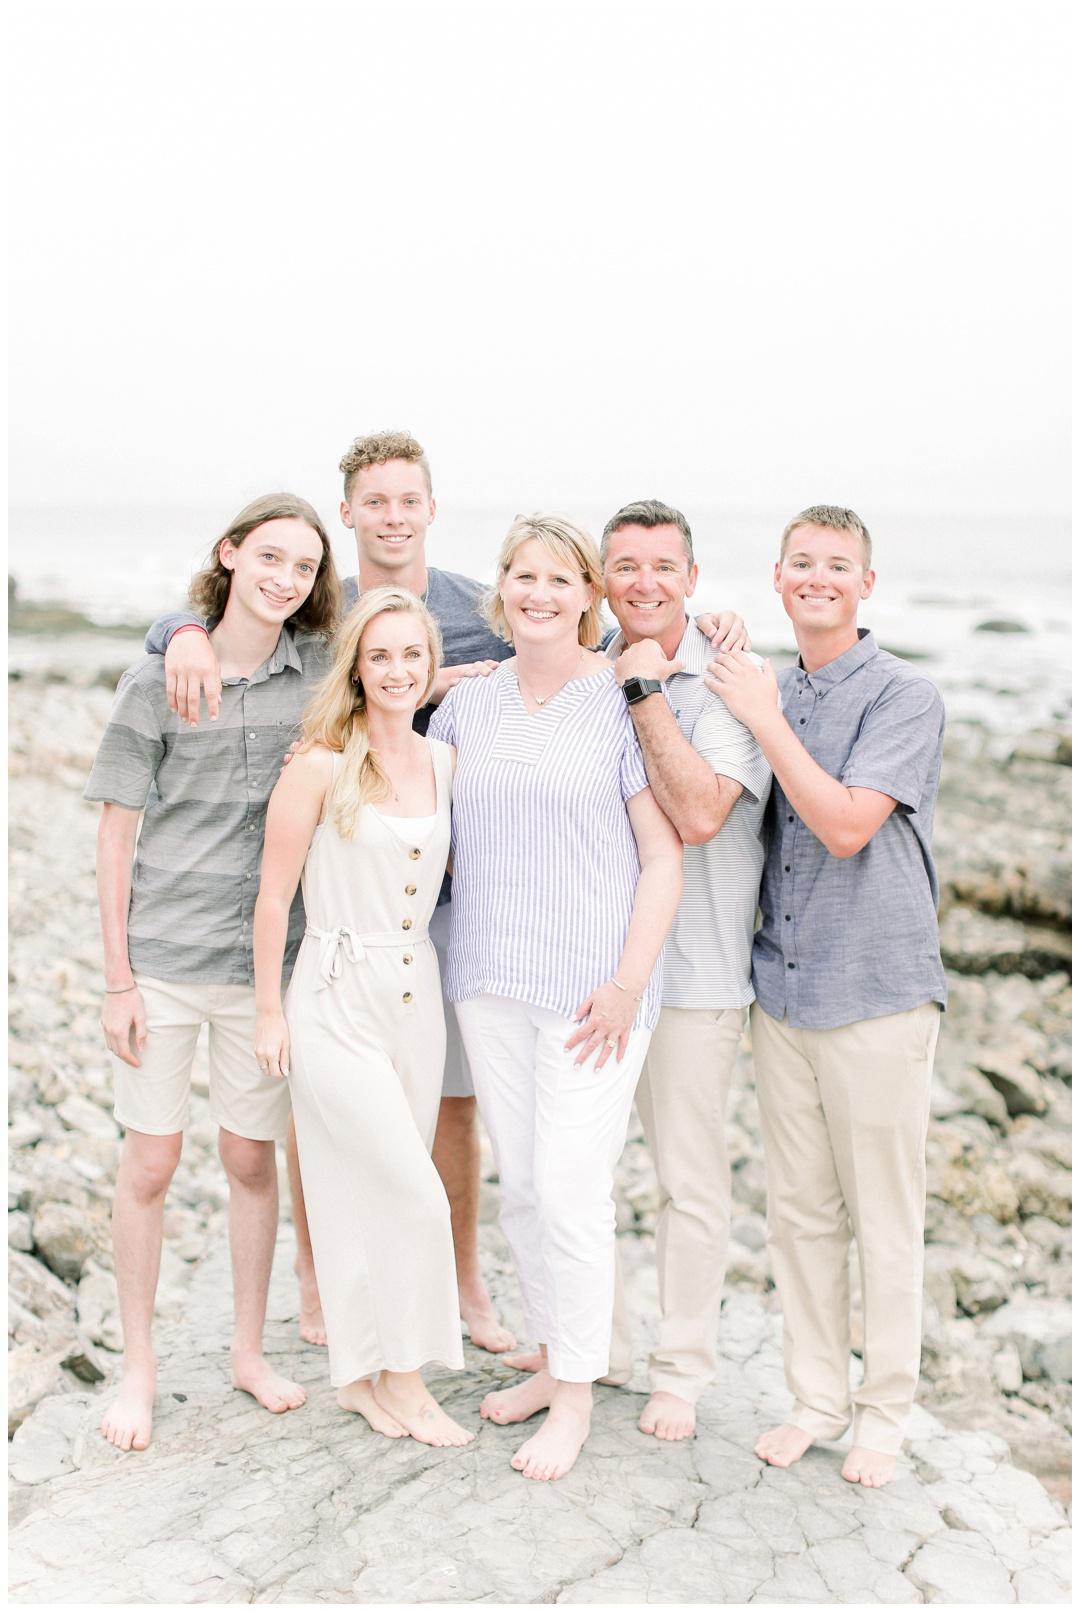 Newport_Beach_Family_Photographer_Orange_County_Family_Photography_Cori_Kleckner_Photography_Orange_County_Family_Photographer_Beach_Family_Session__1227.jpg